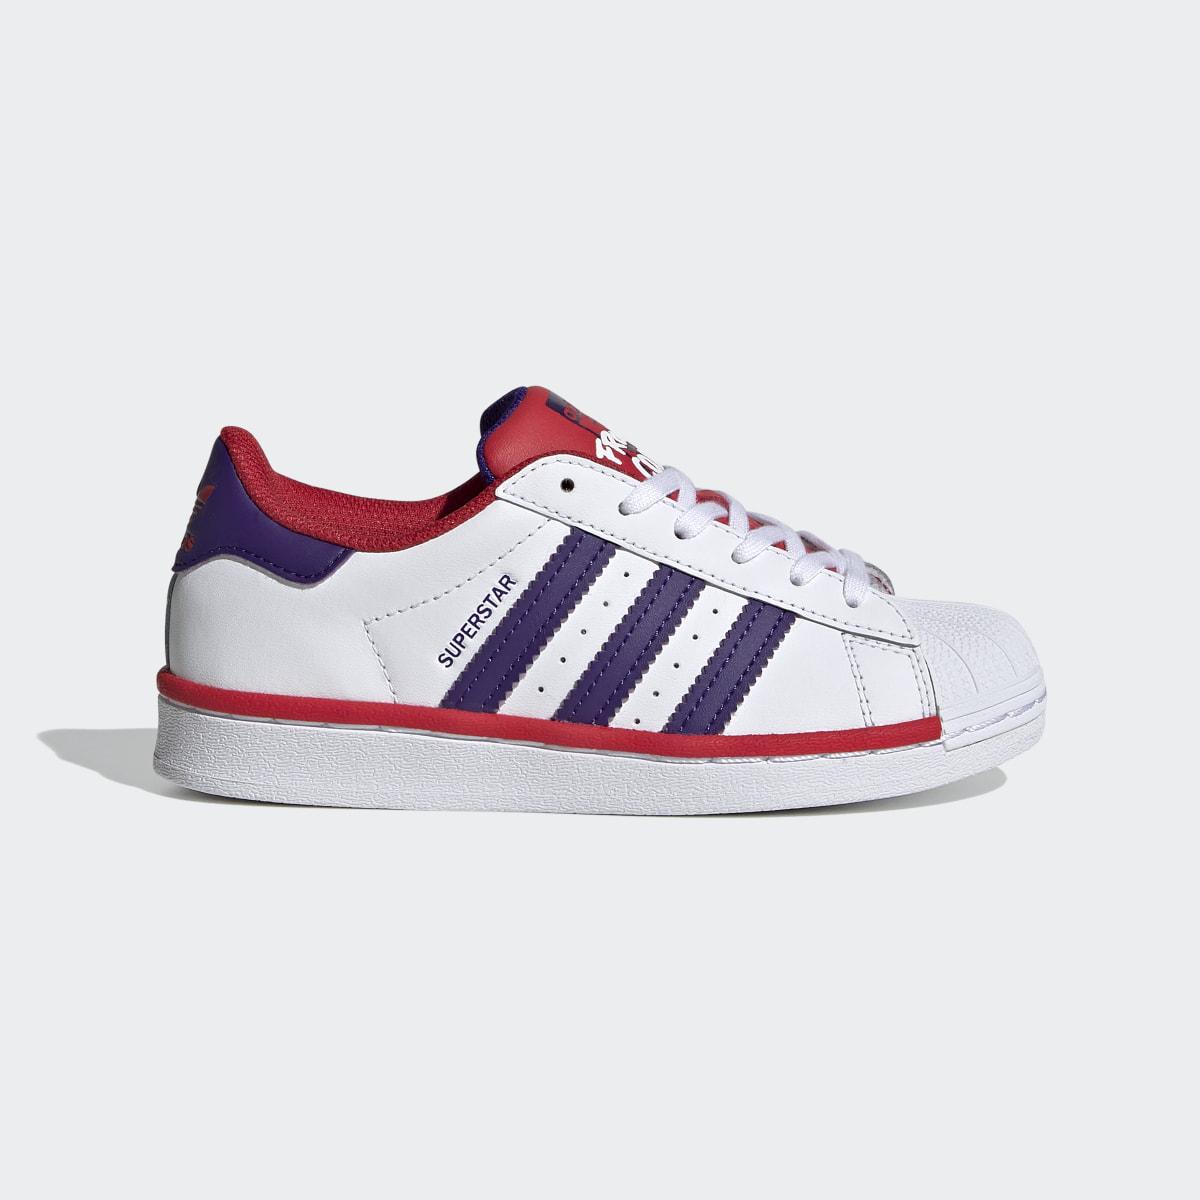 Adidas Superstar Slip On Floral Tam. 38 | Sapato Feminino